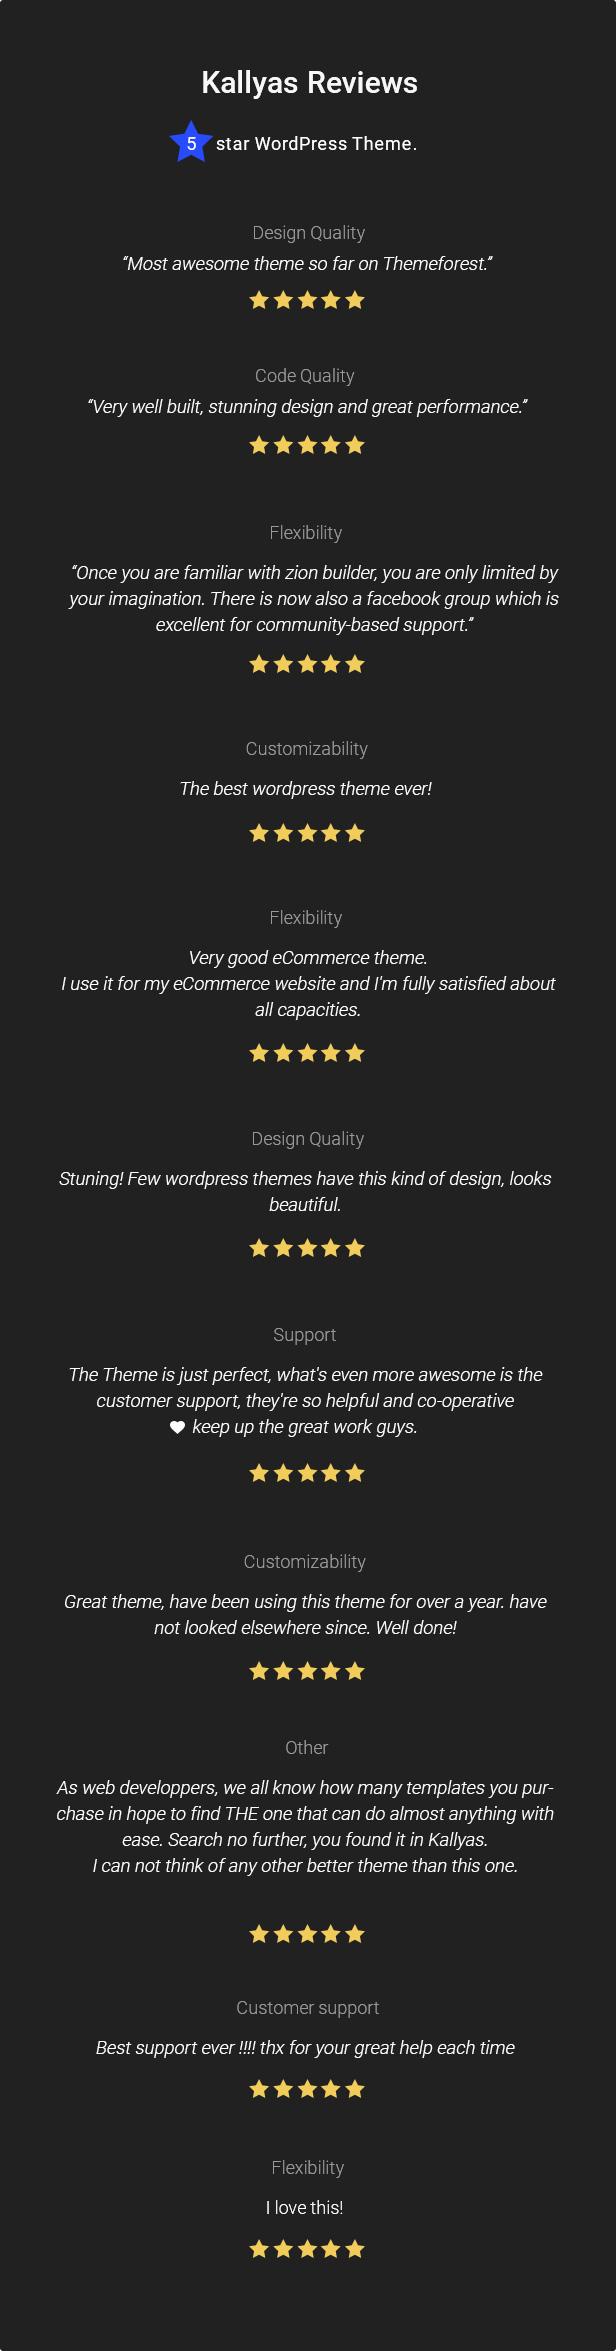 06.kallyas reviews - KALLYAS - Creative eCommerce Multi-Purpose WordPress Theme